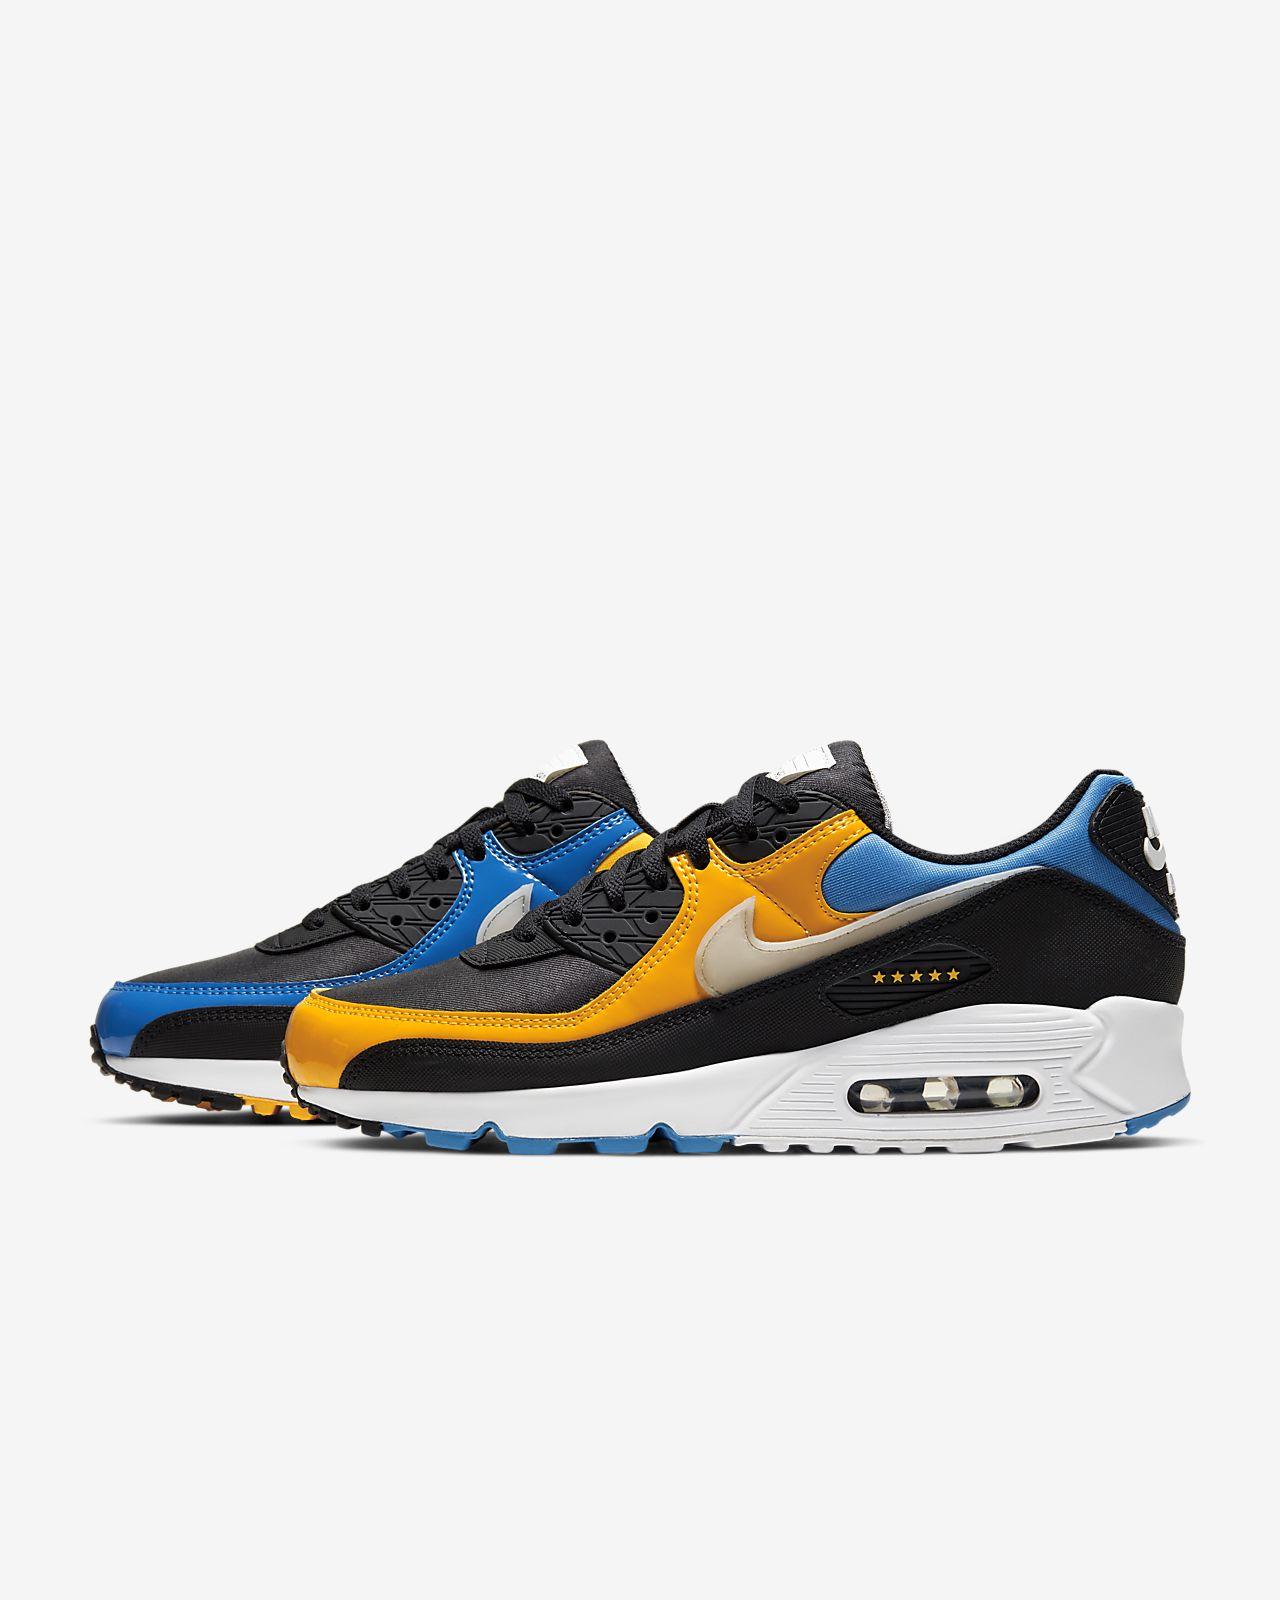 Nike Air Max 90 Premium CK0902 001 Black  Orange Jungle